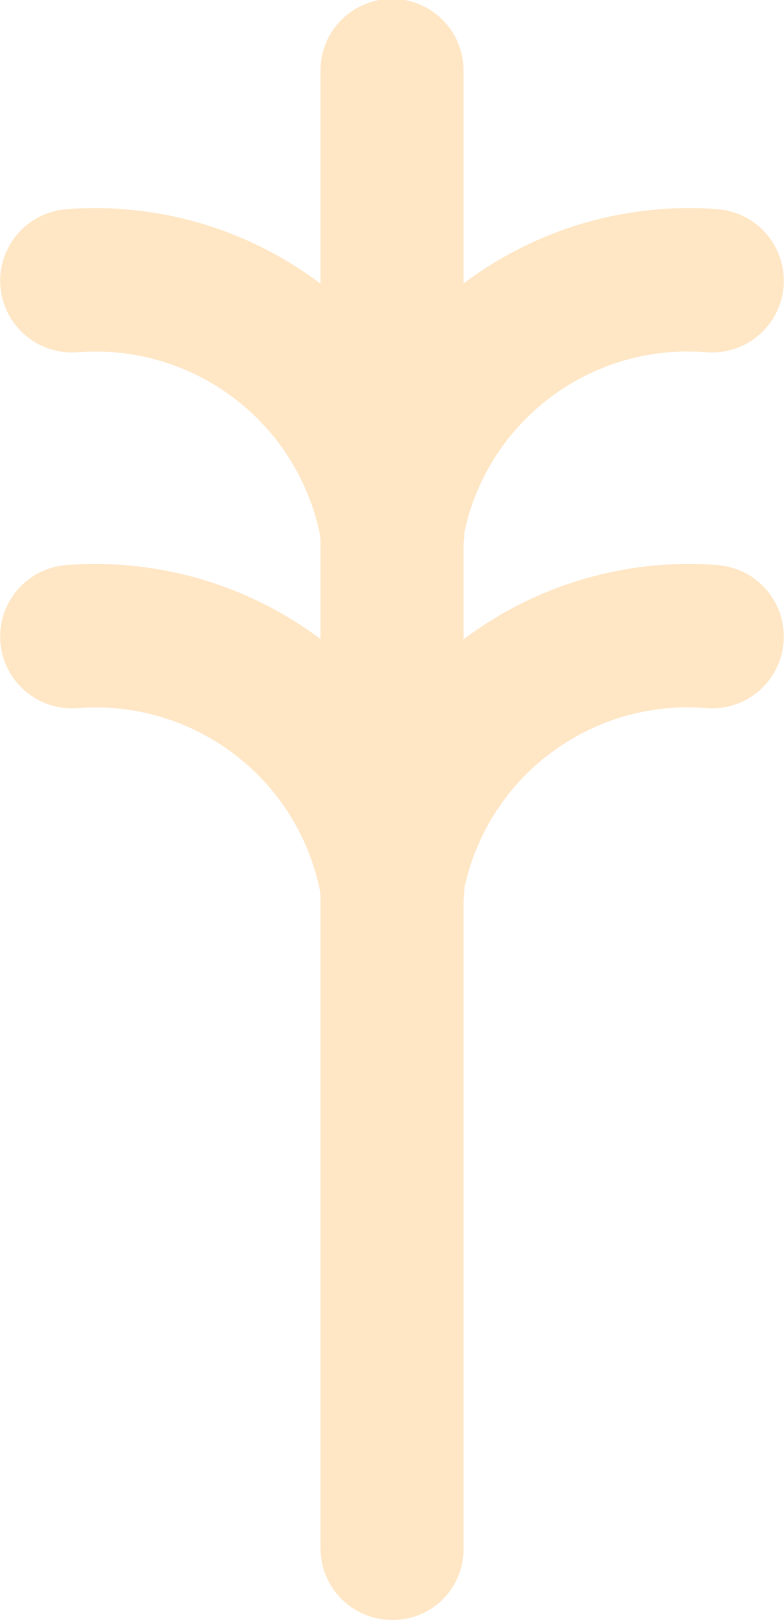 Baum orange Clipart-Grafik als PNG, SVG